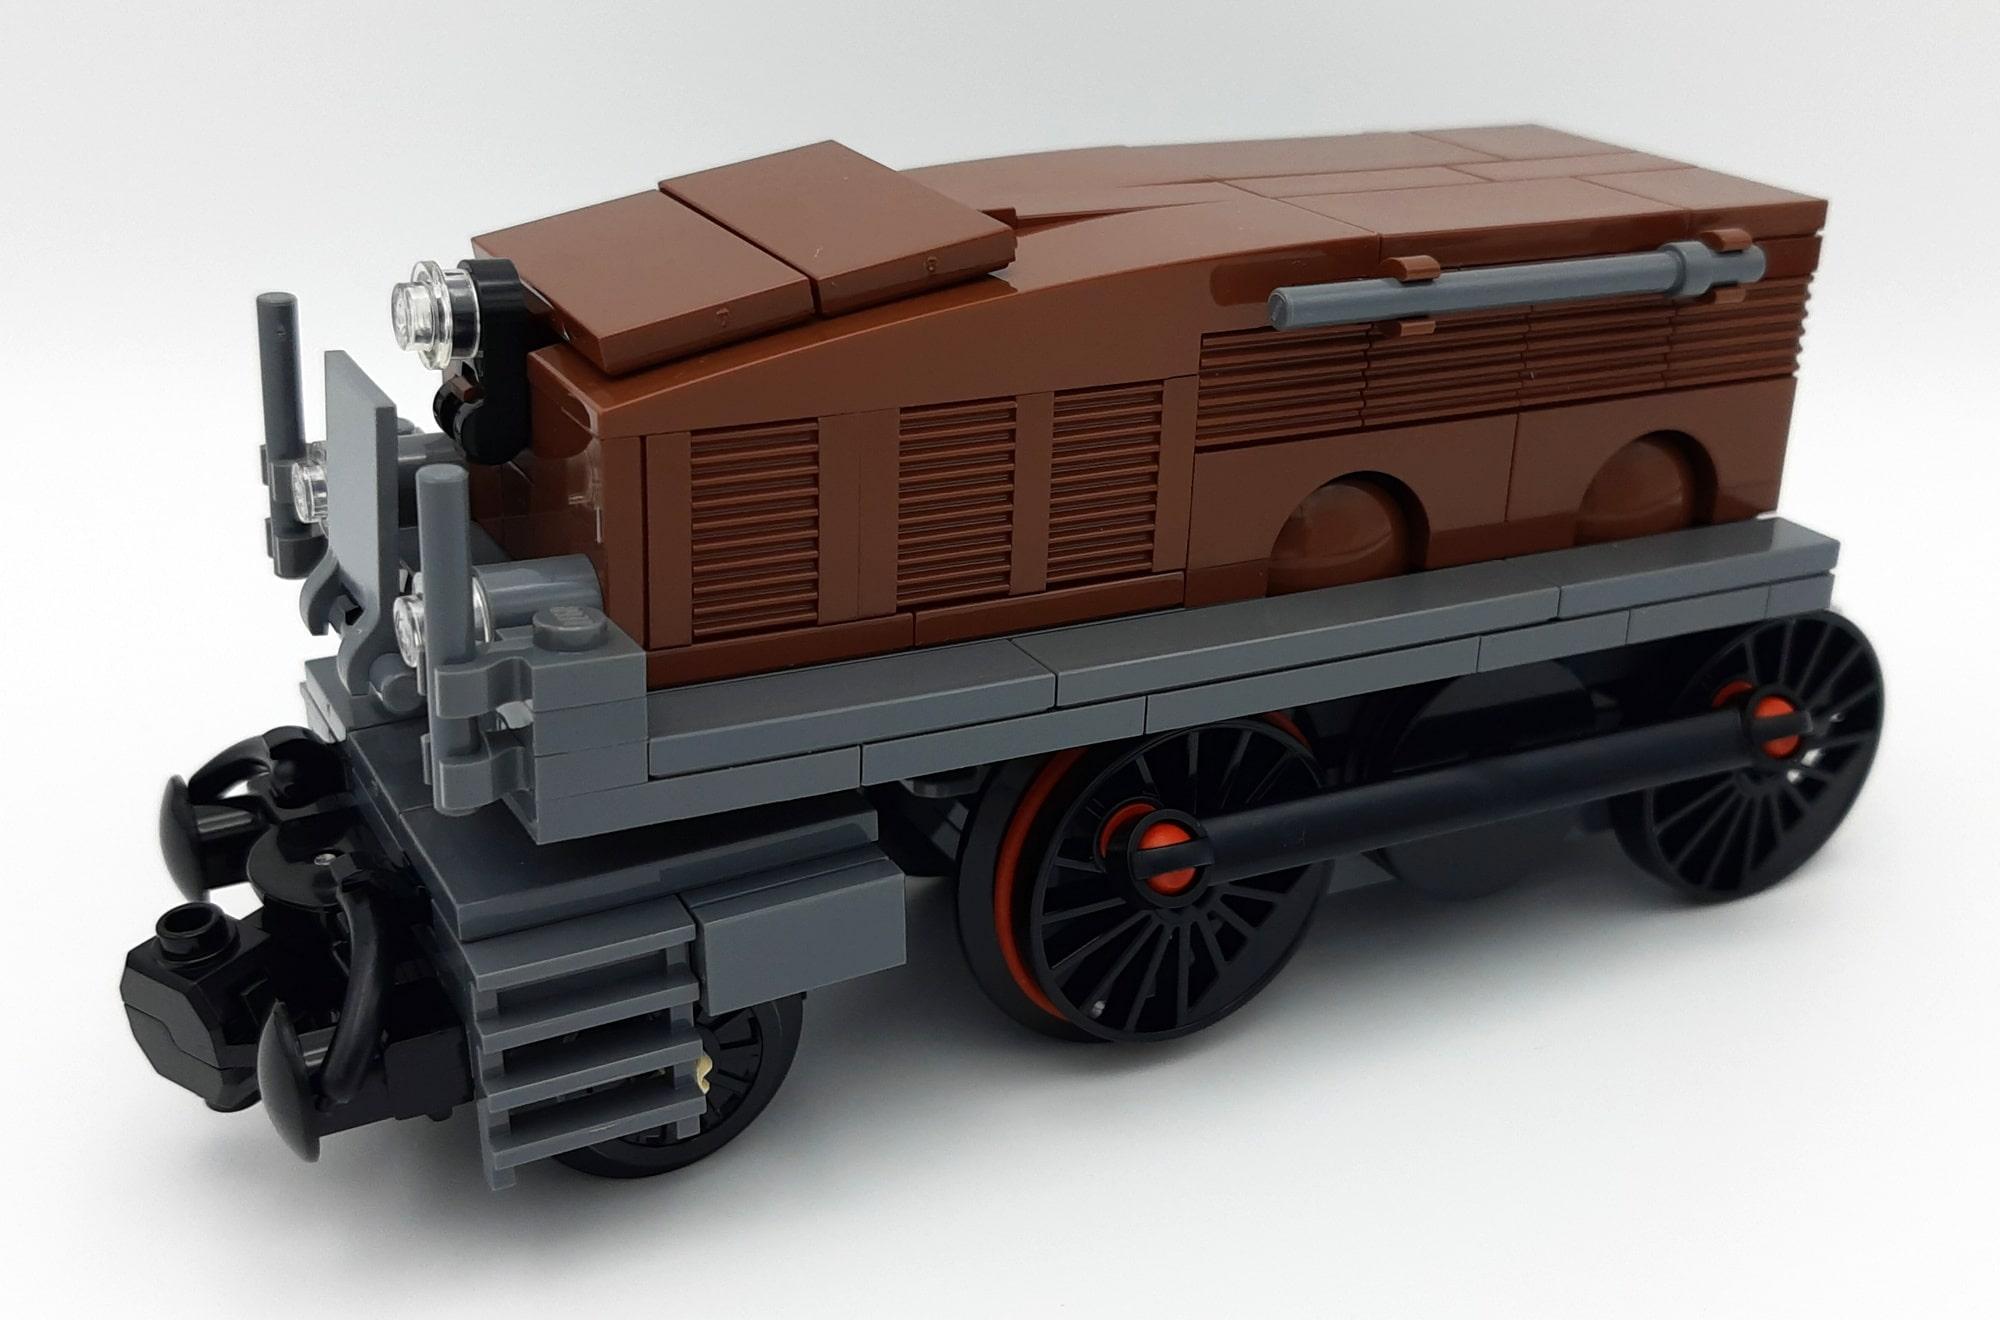 LEGO 10277 Krokodil Lokomotive - Bauabschnitt 4